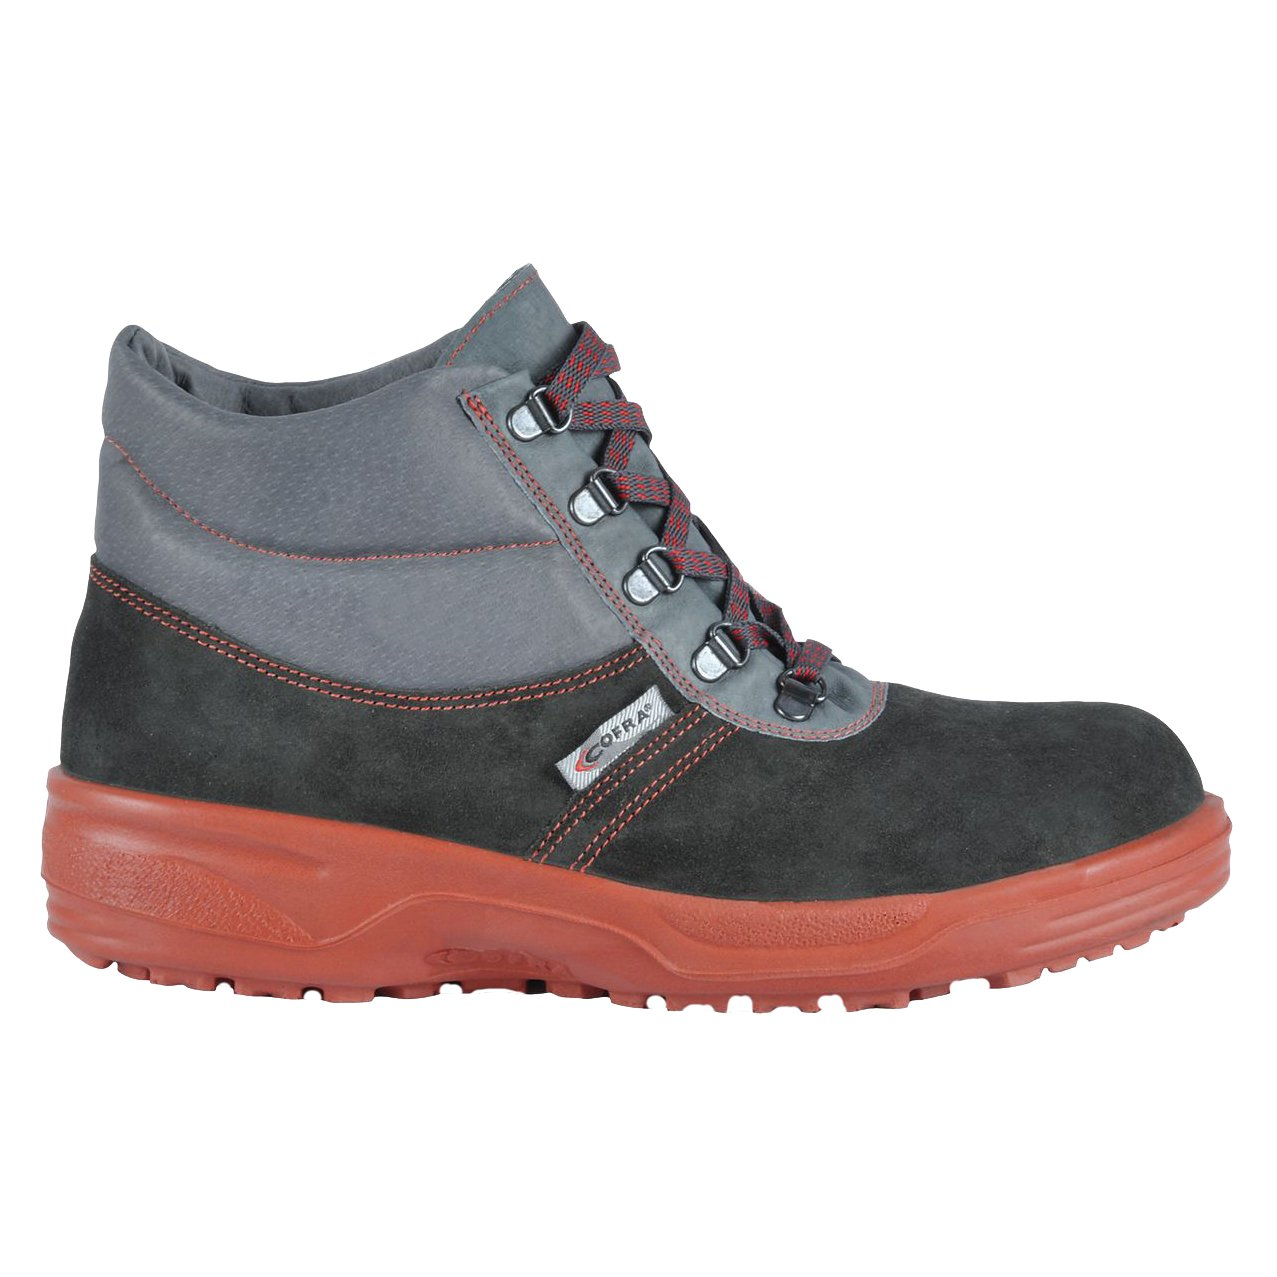 /Grau Cofra 34025 007.w43/Gr/ö/ße 43/O3/SRC FO New Tasse Sicherheit Schuhe/